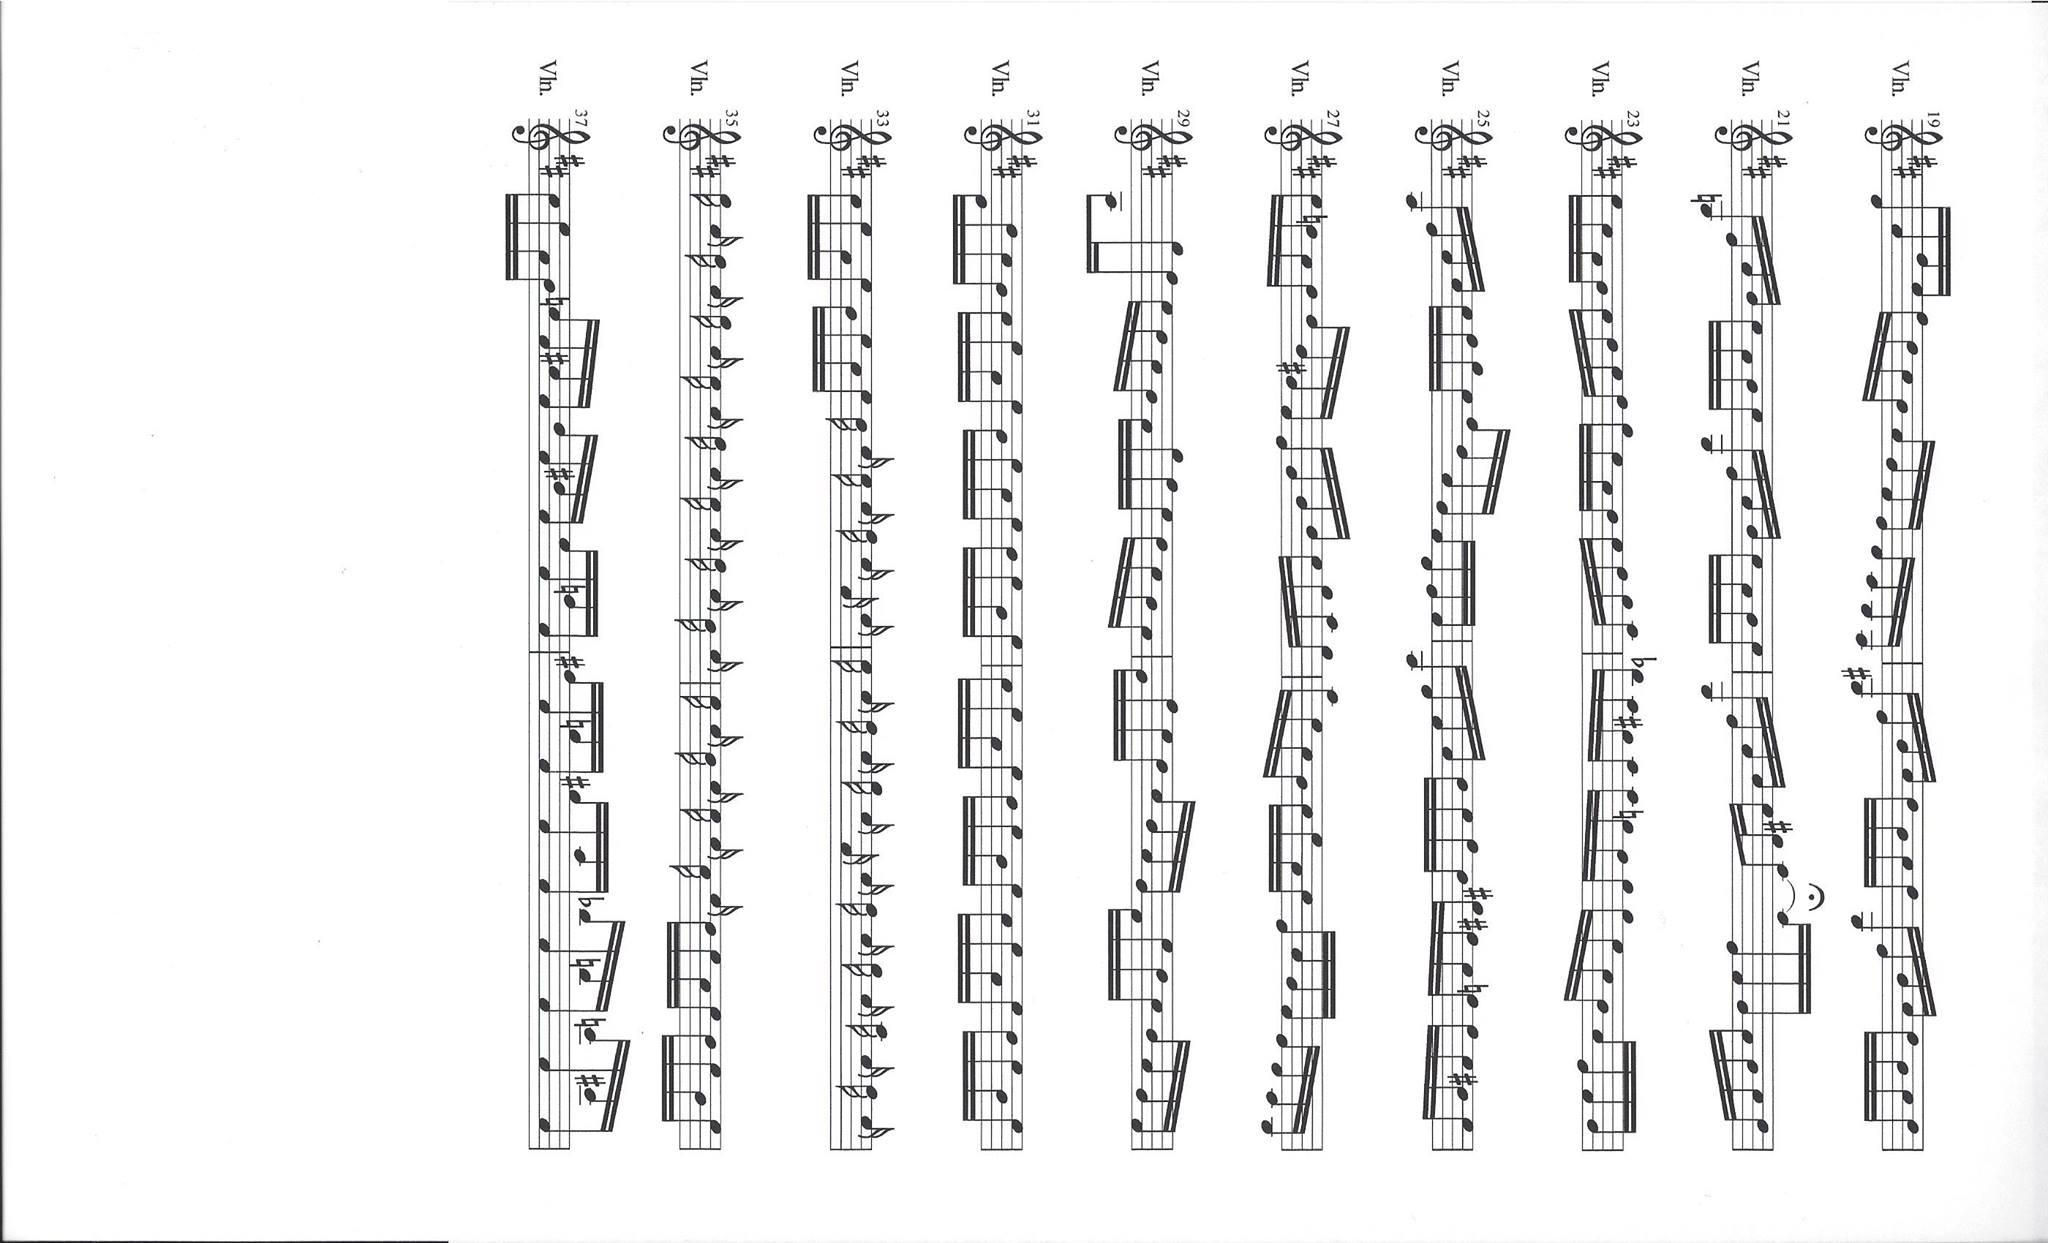 transposed bach u0026 39 s cello suite no  1